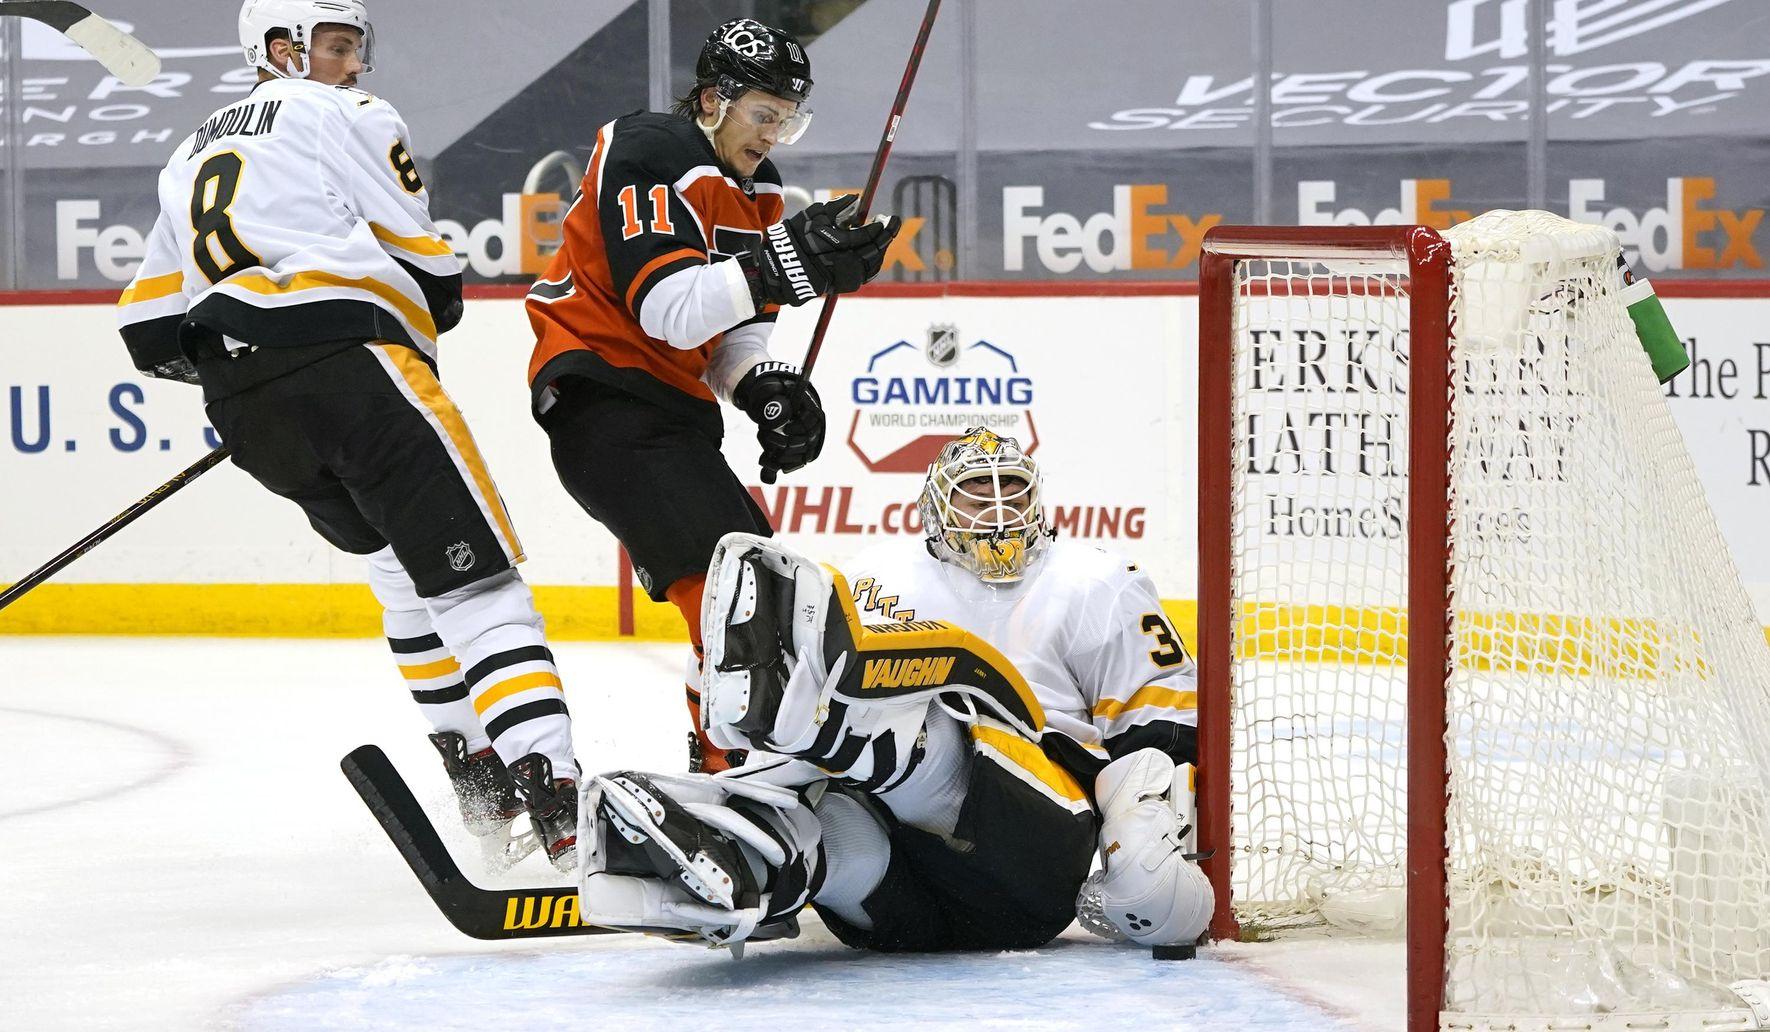 Giroux, Couturier score in shootout as Flyers edge Pens